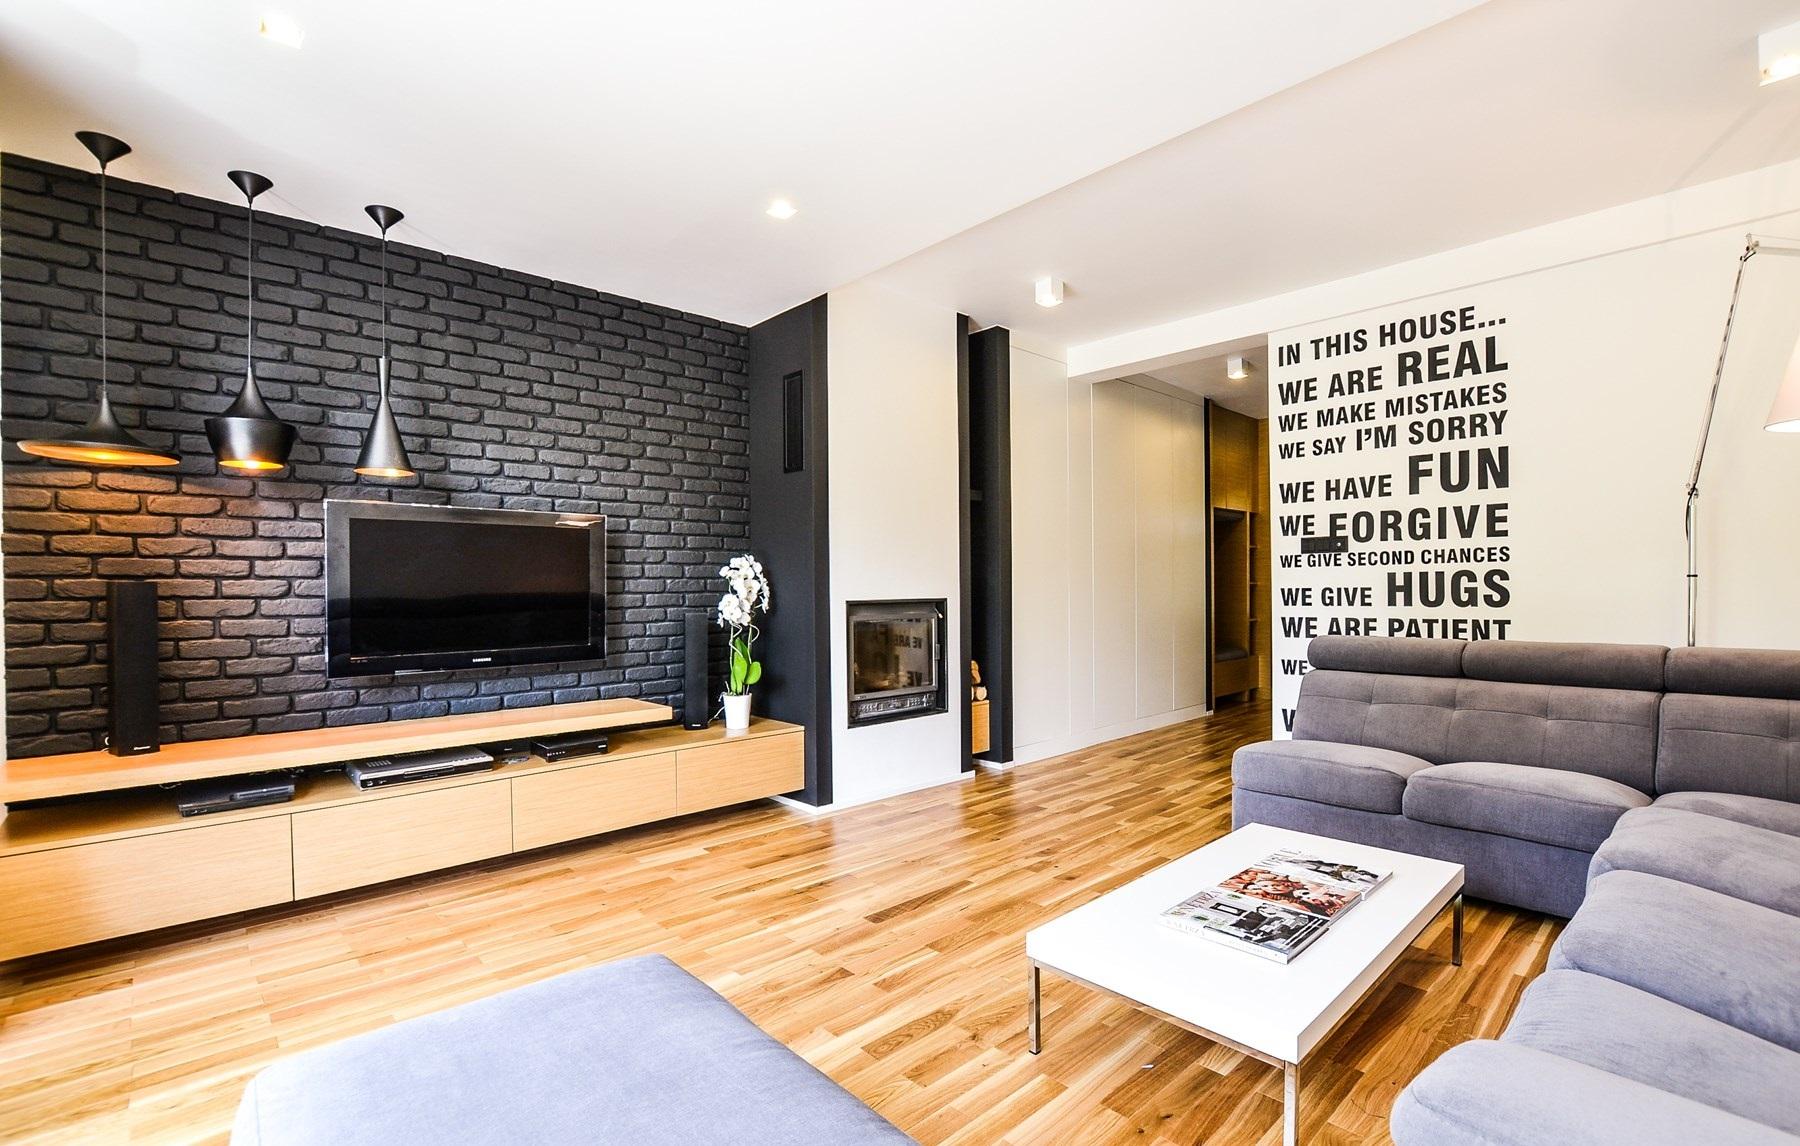 ciana z ceg y plusy i minusy dom wp pl. Black Bedroom Furniture Sets. Home Design Ideas